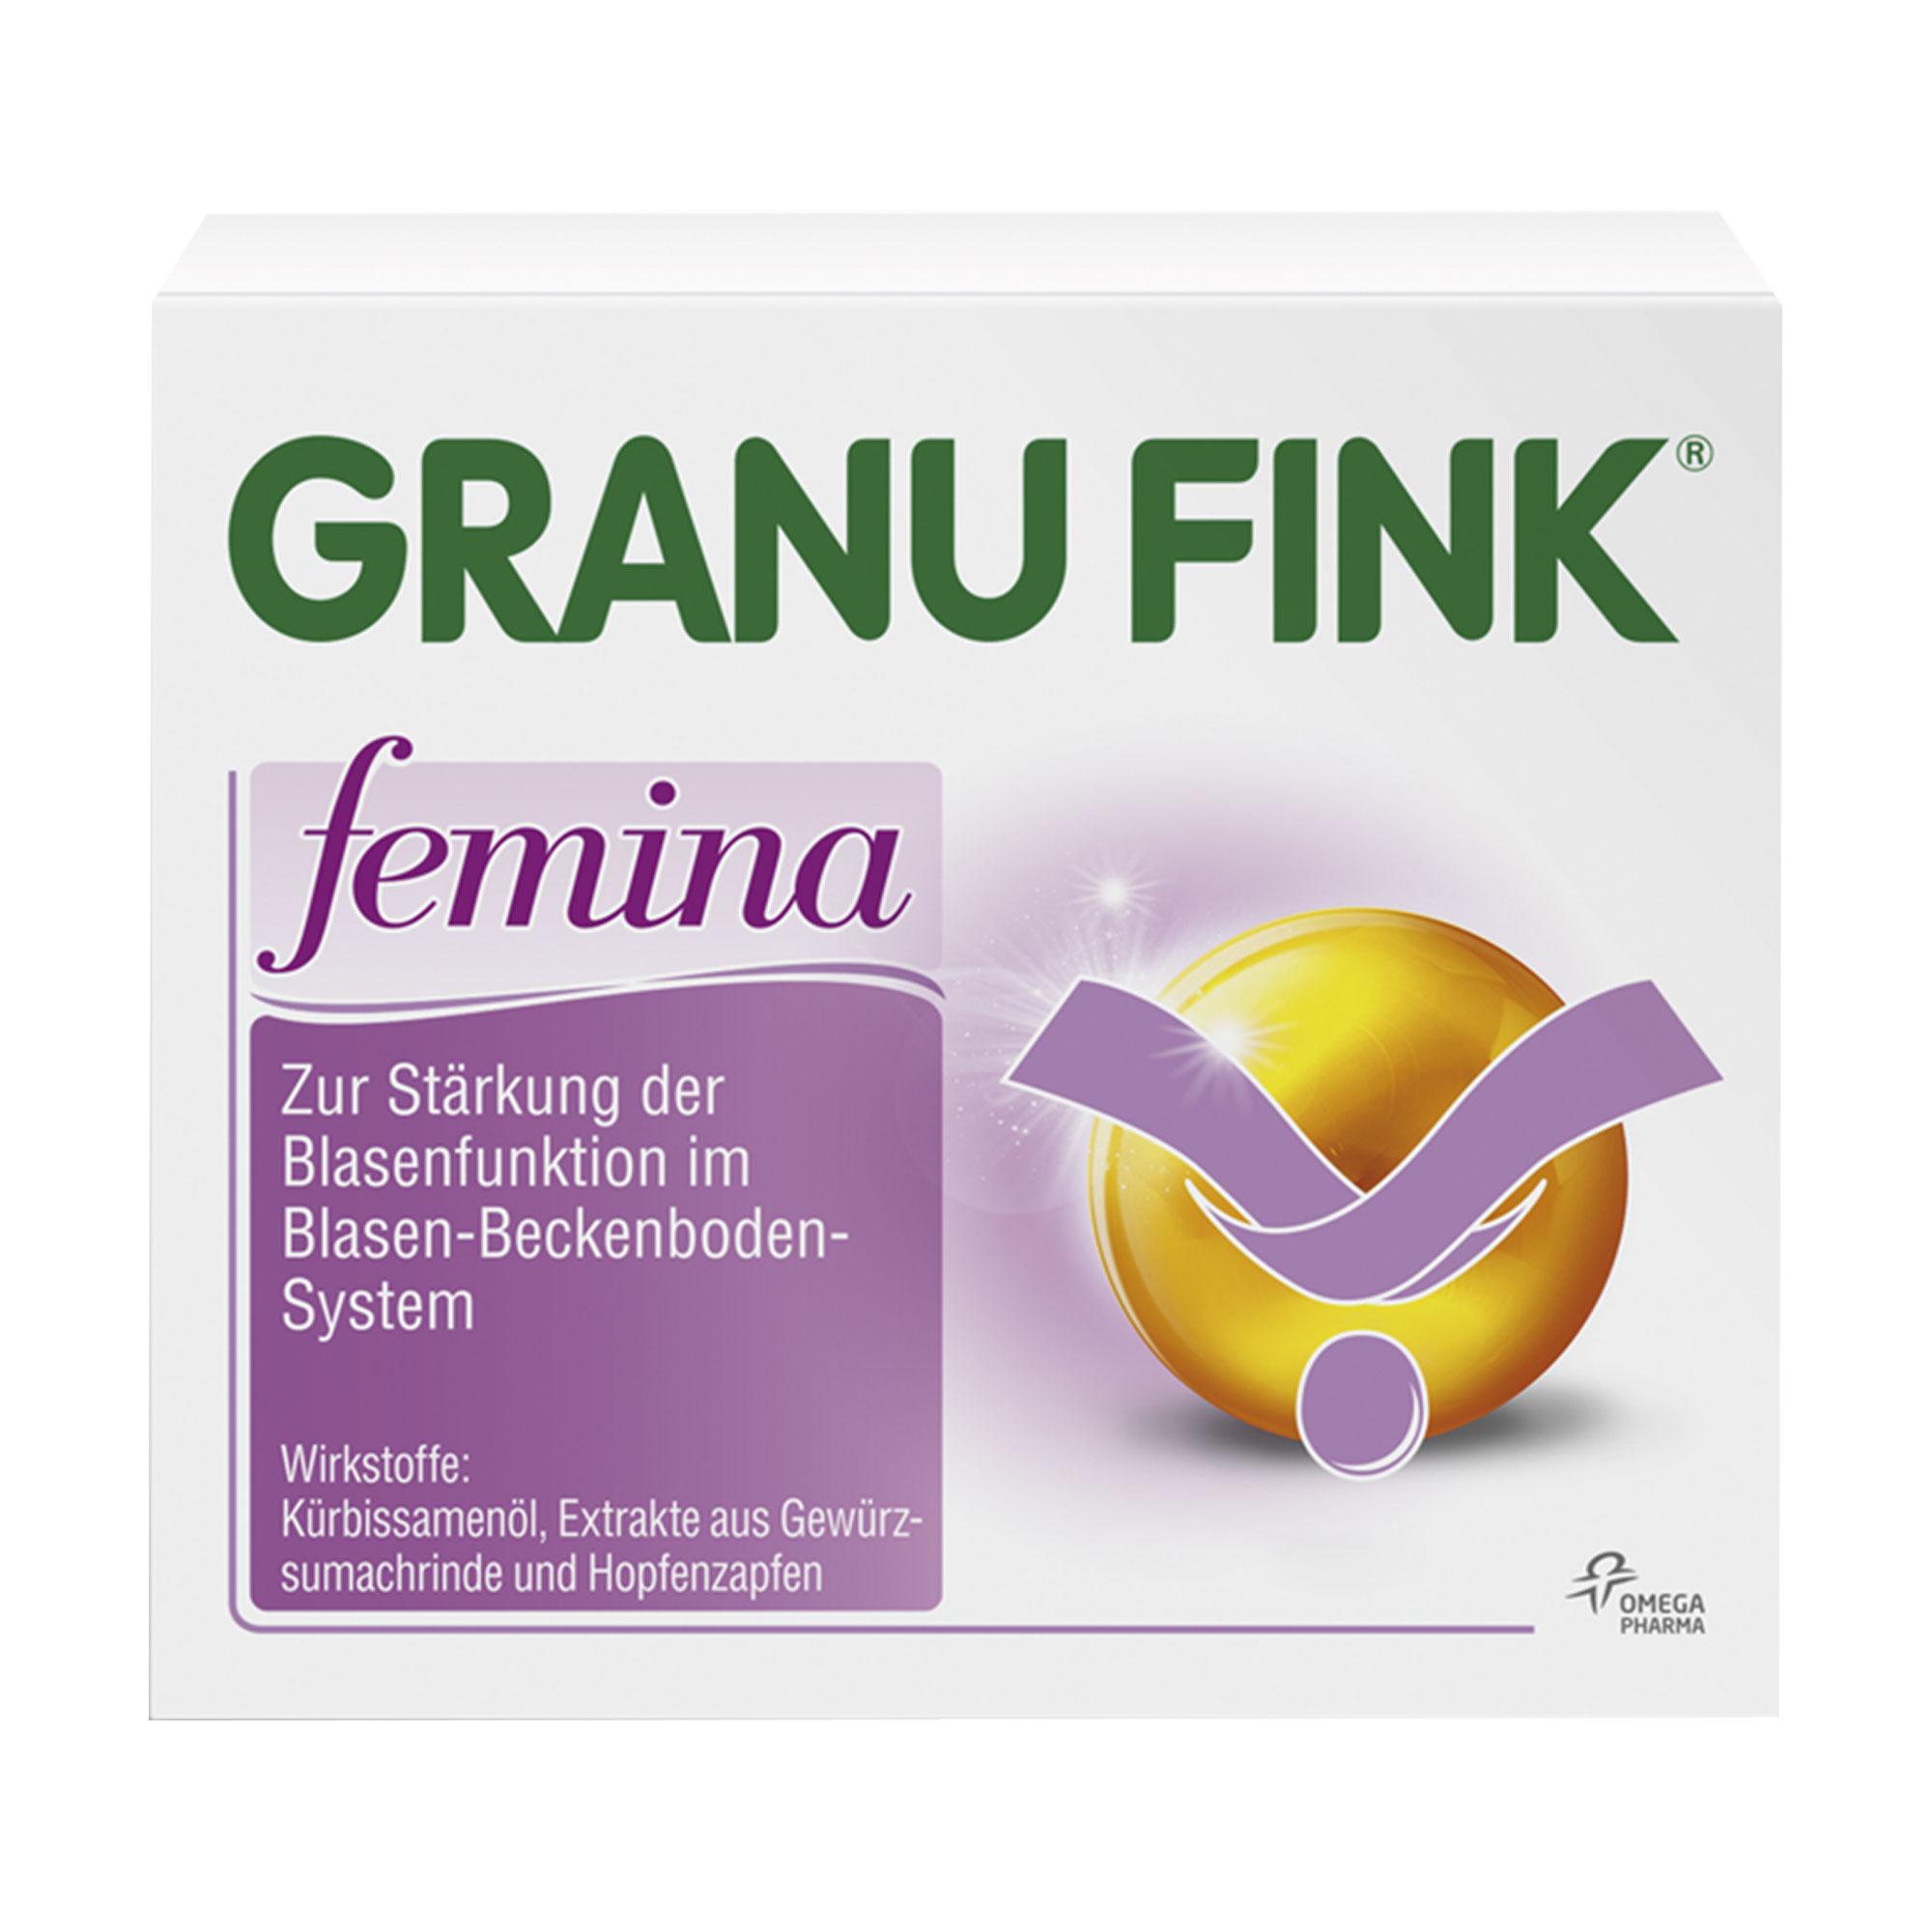 granufink femina forum f r arzneimittel und. Black Bedroom Furniture Sets. Home Design Ideas